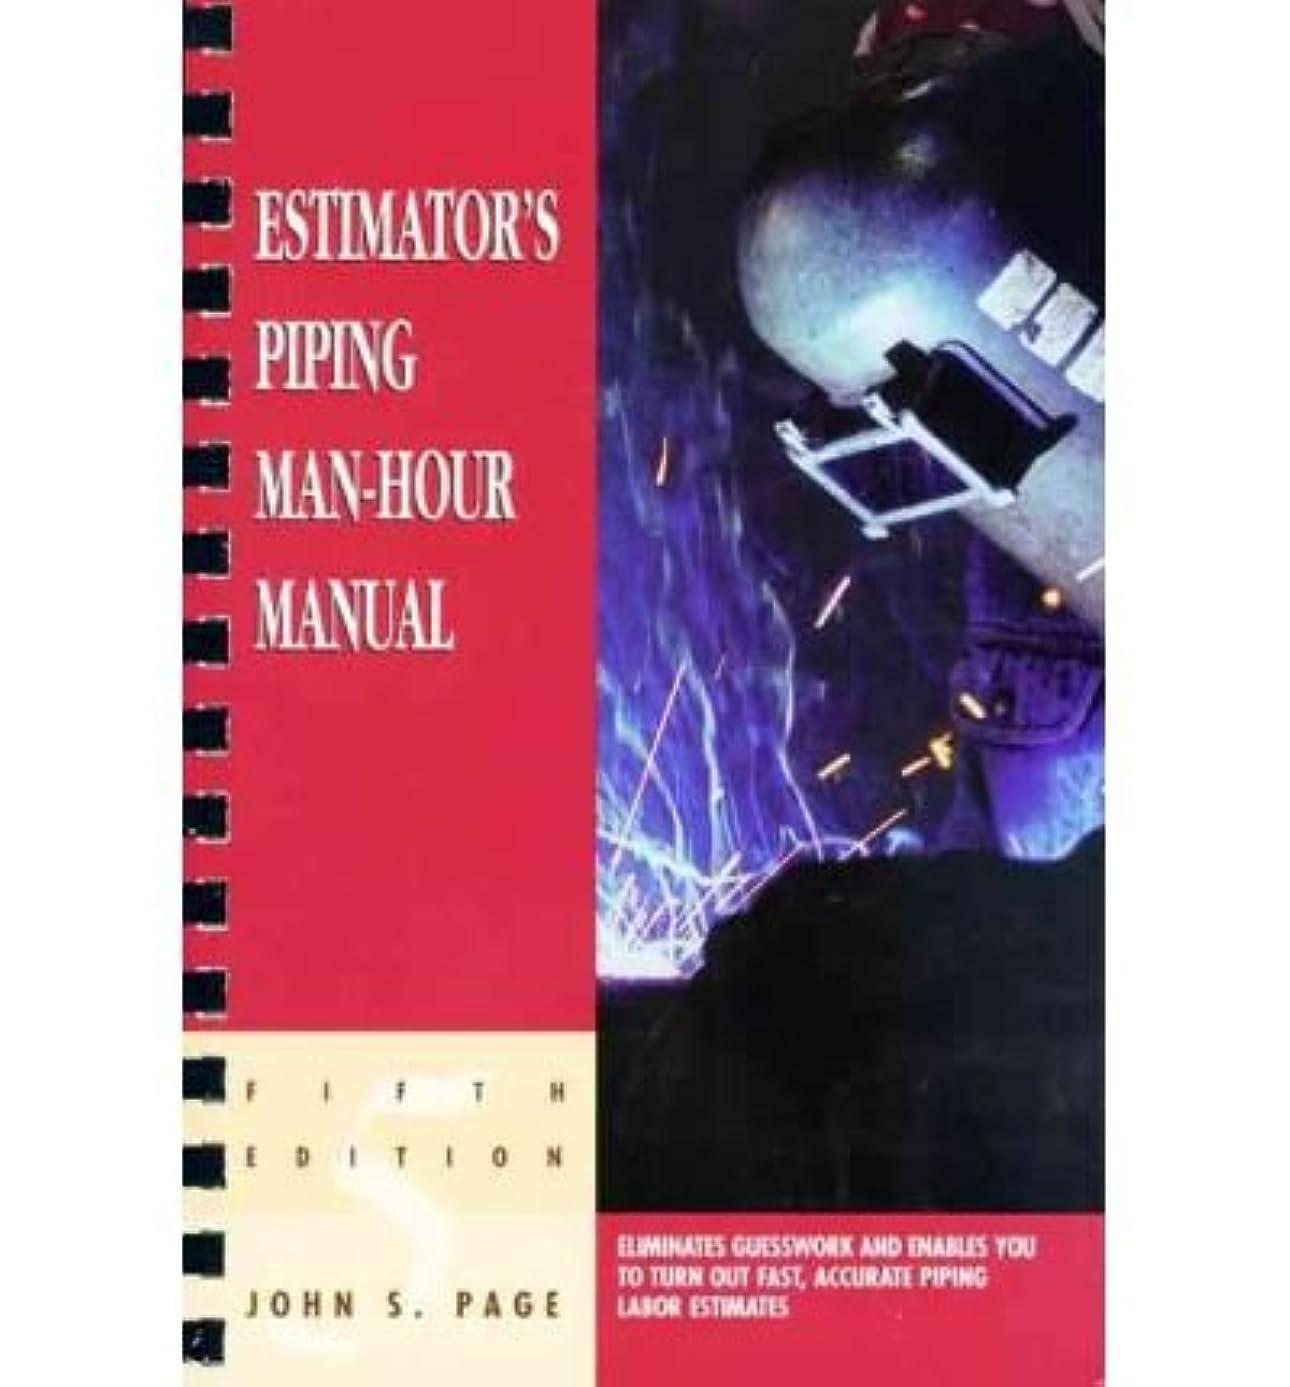 [(Estimator's Piping Man-Hour Manual )] [Author: John S. Page] [Jun-1999]